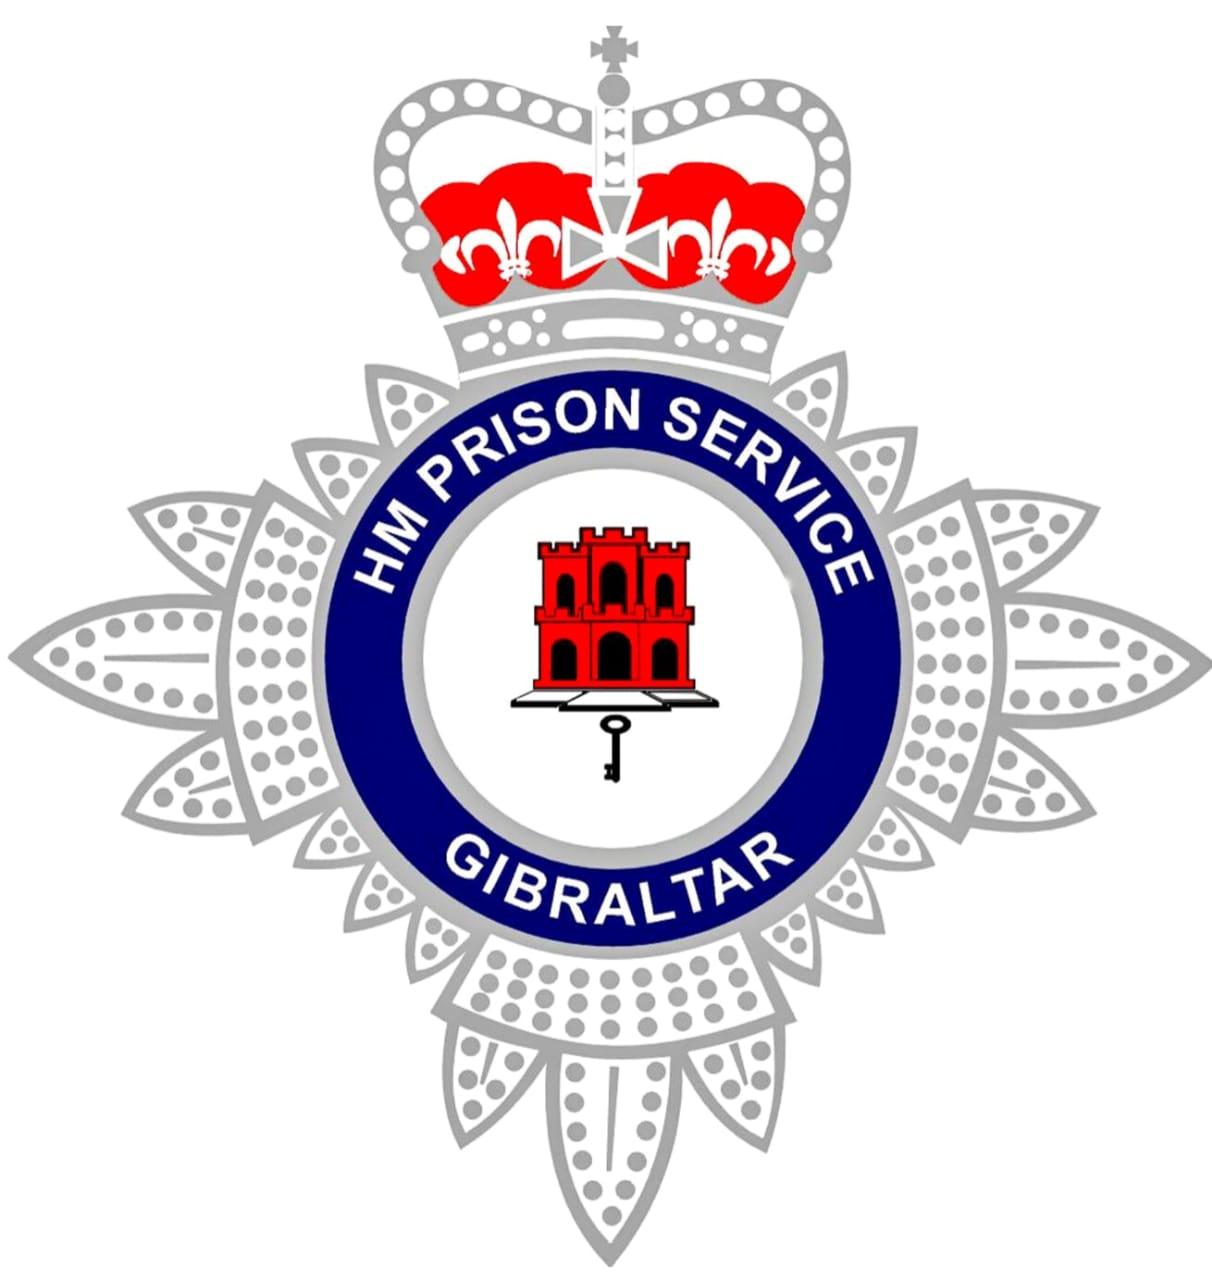 Prison service logo